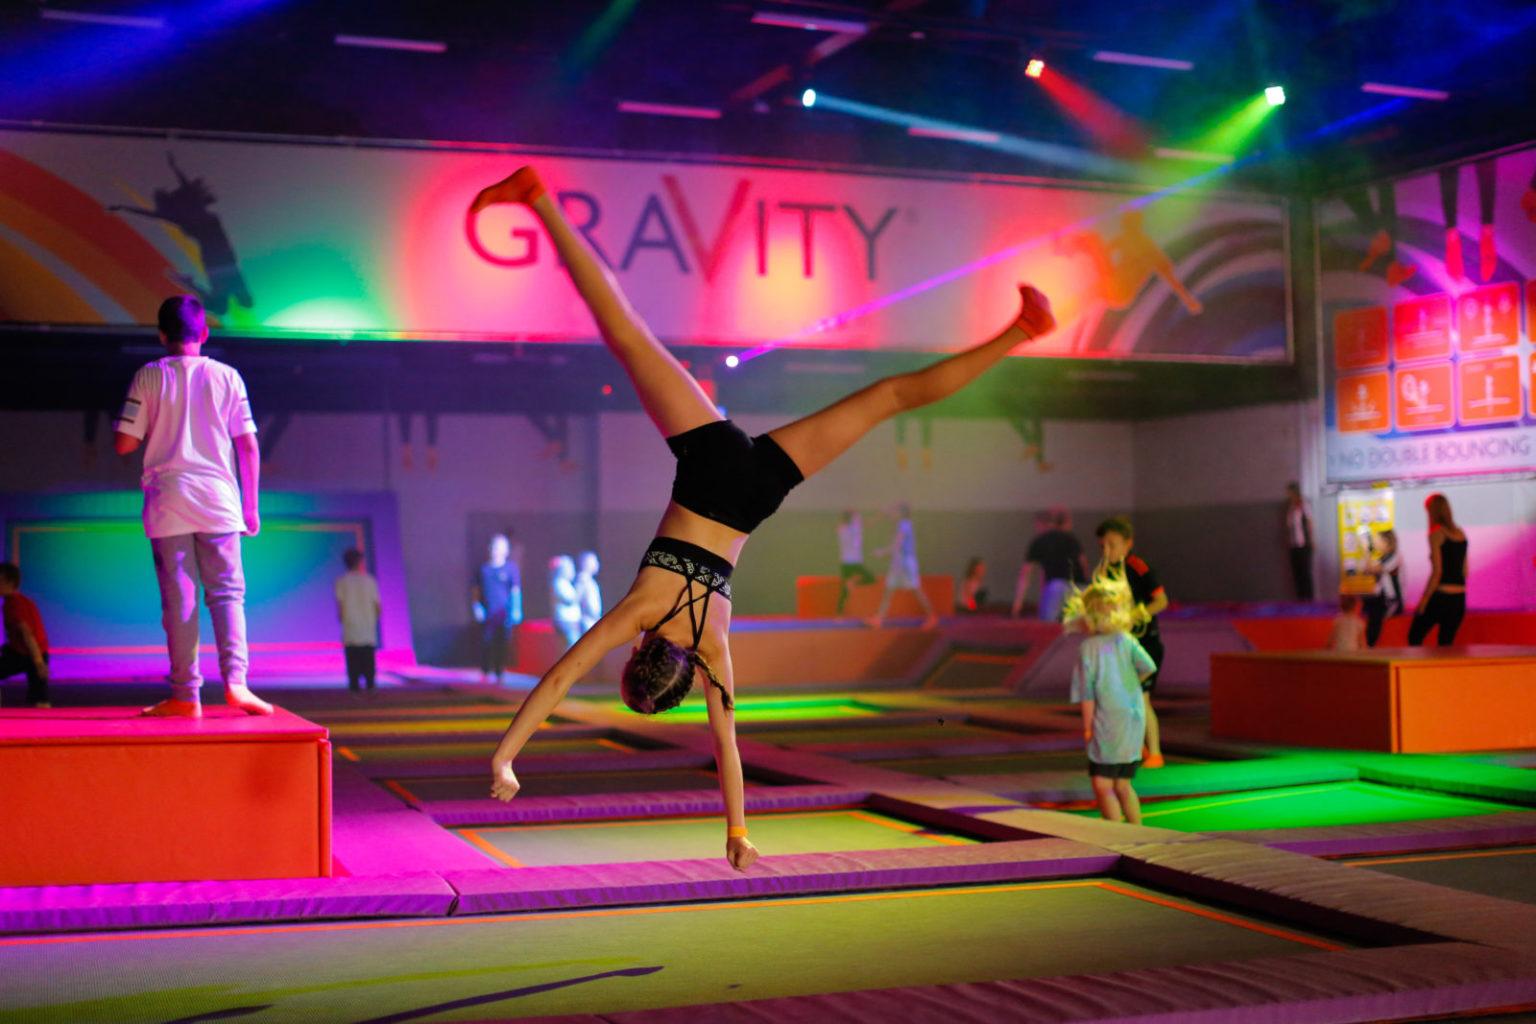 Gravity Franchise Park